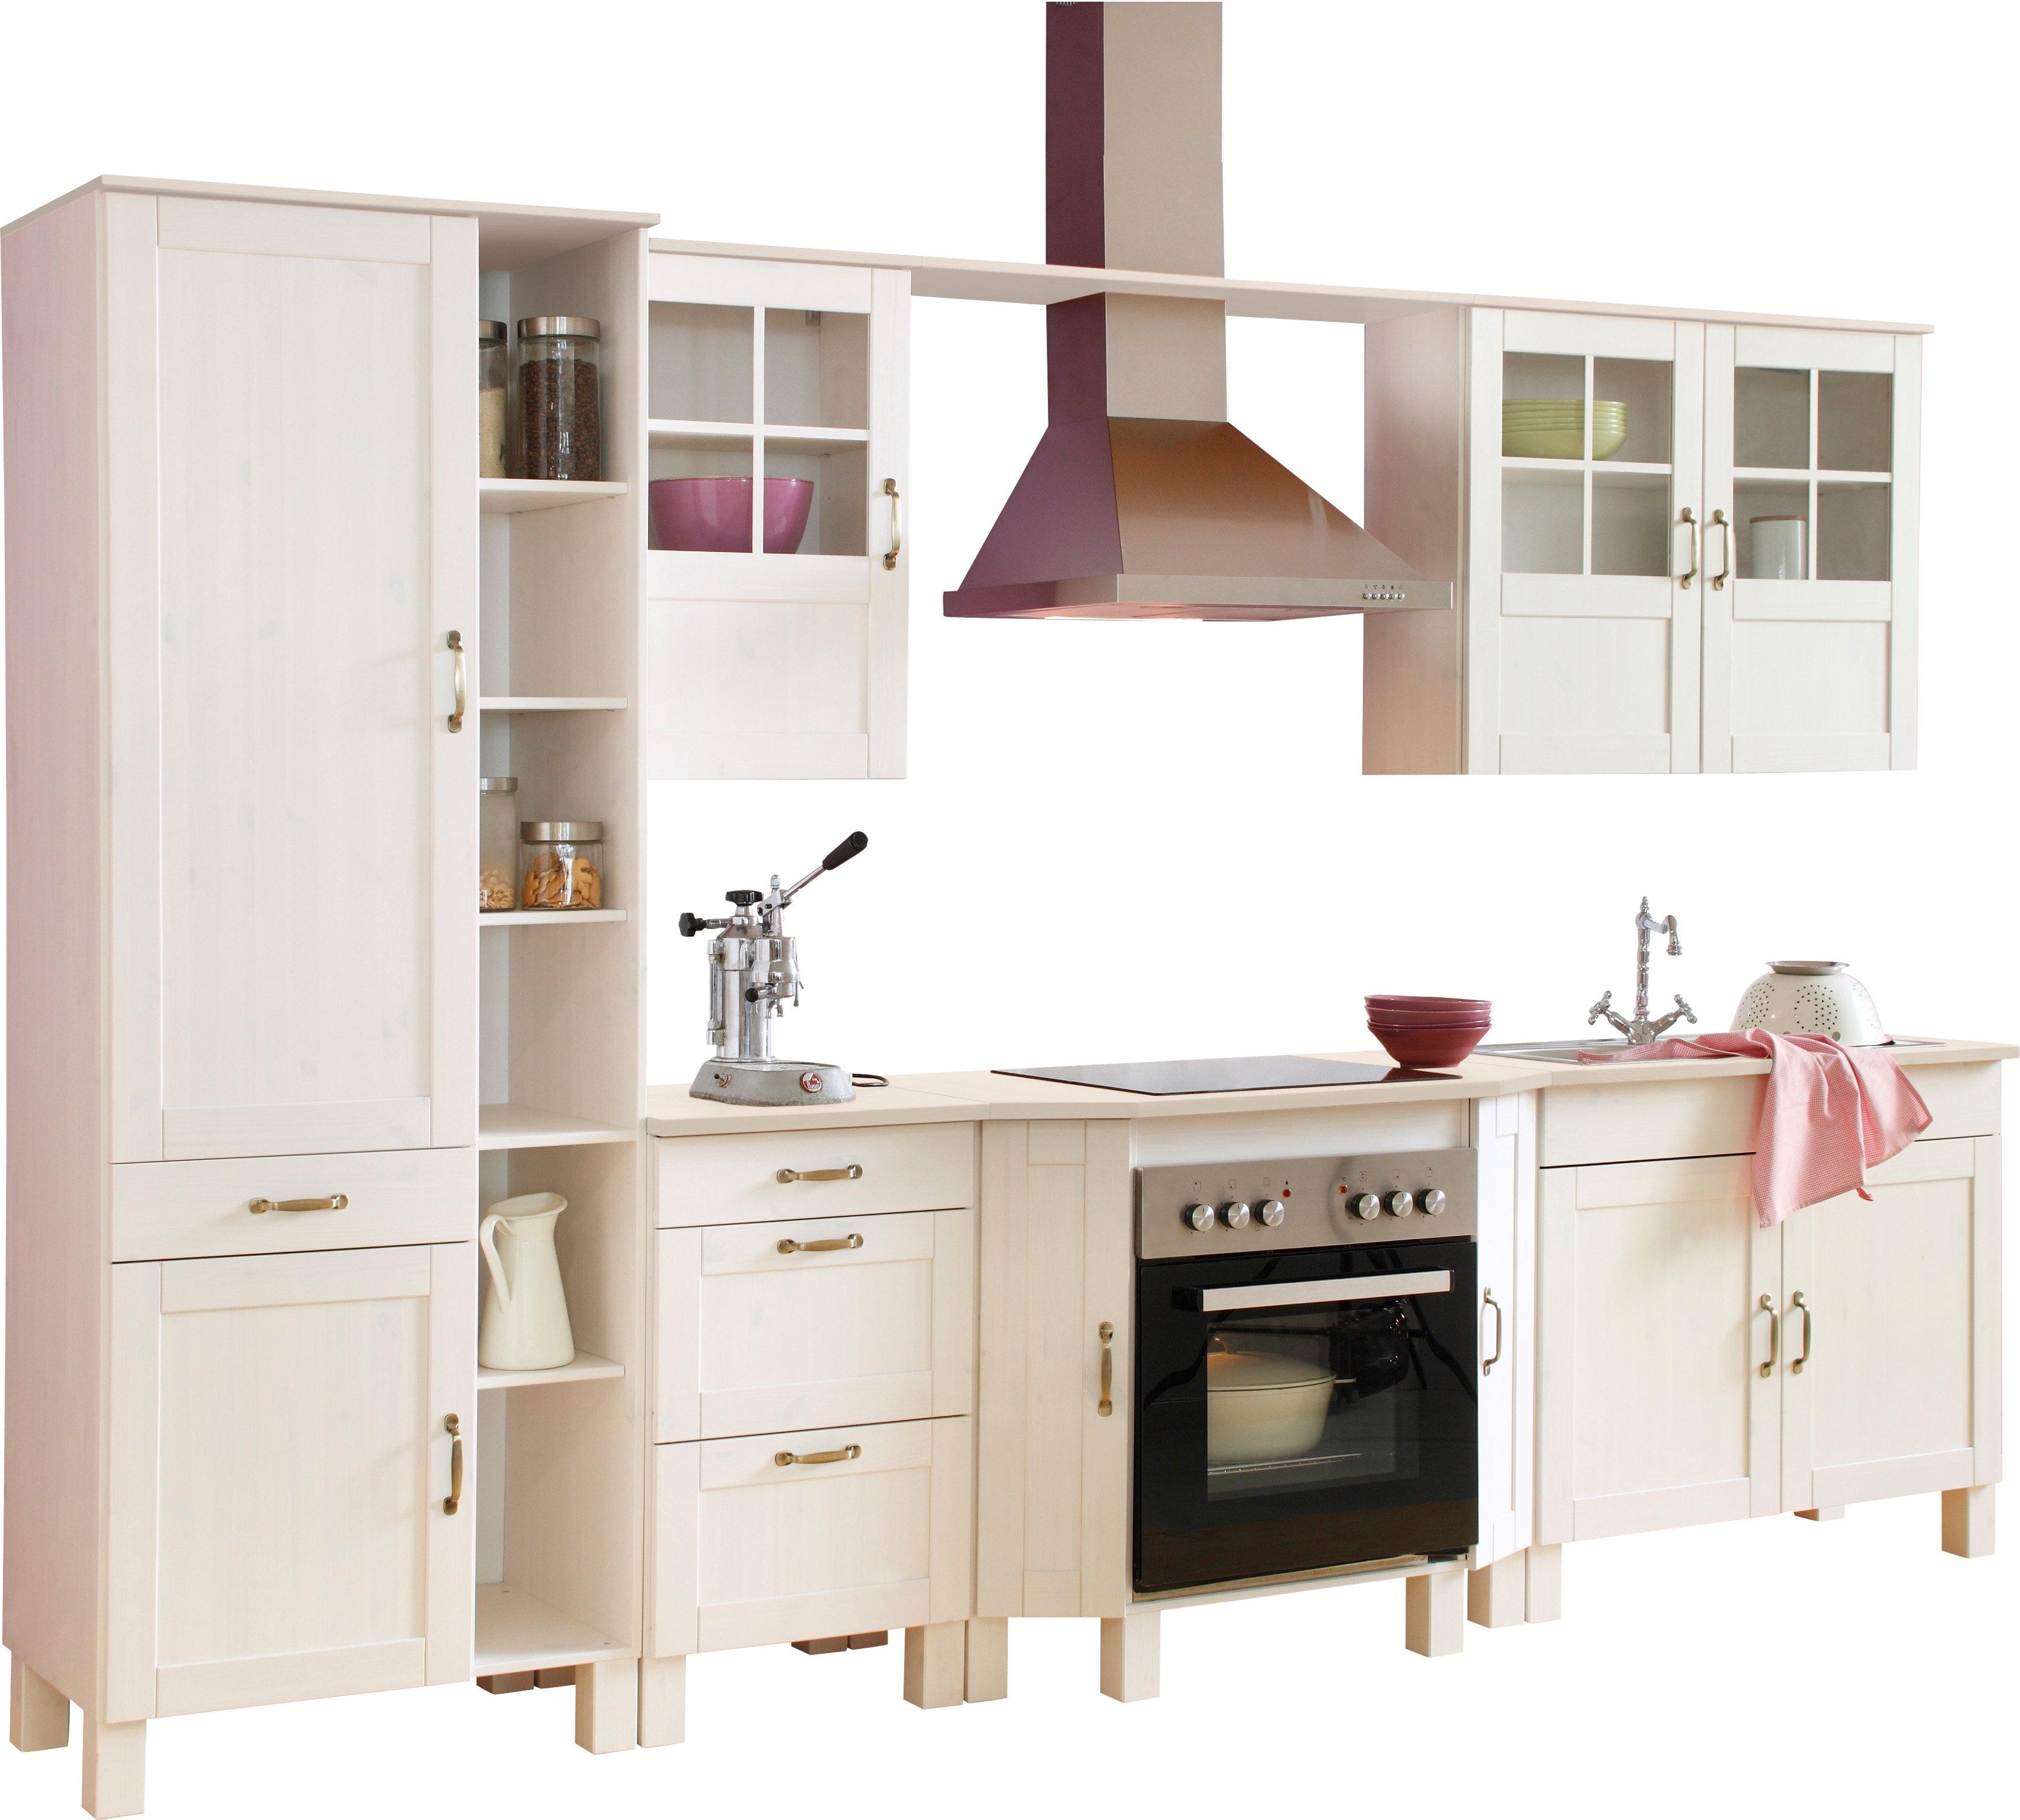 Home affaire Keukenblok »Alby« breedte 325 cm nu online bestellen